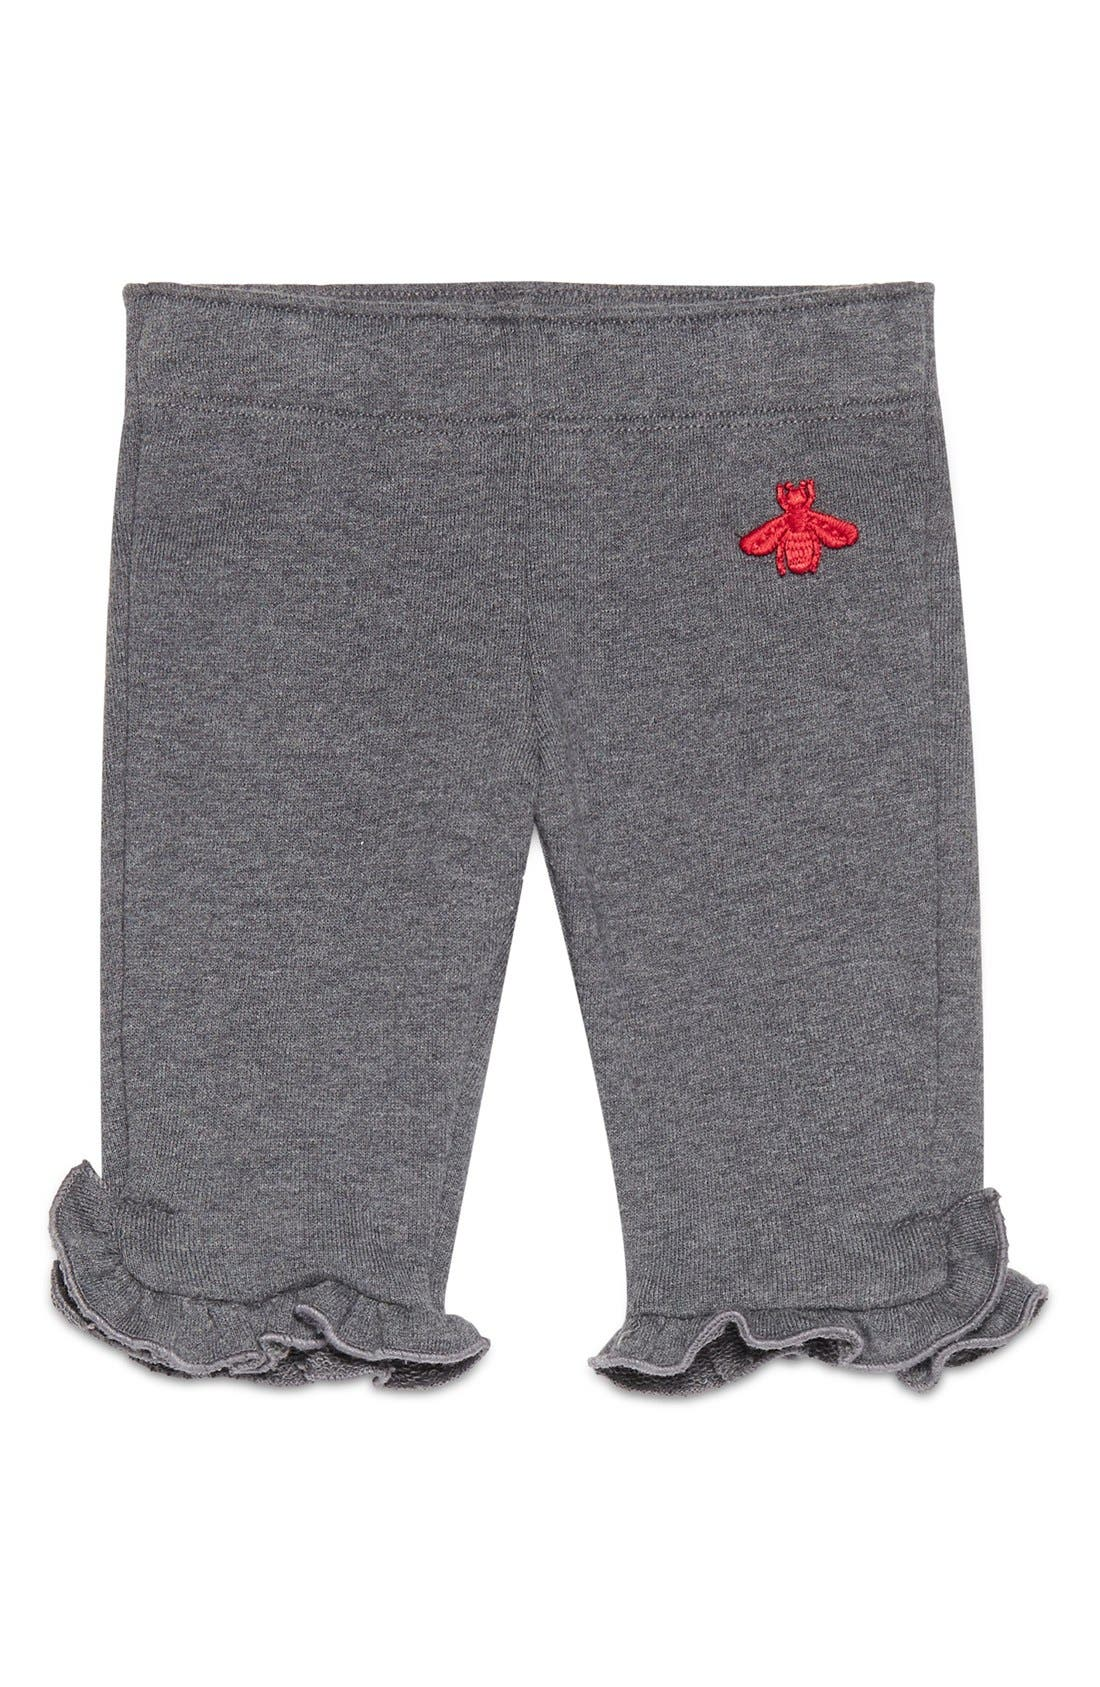 Alternate Image 1 Selected - Gucci Bee Ruffle Hem Jogger Pants (Baby Girls & Toddler Girls)